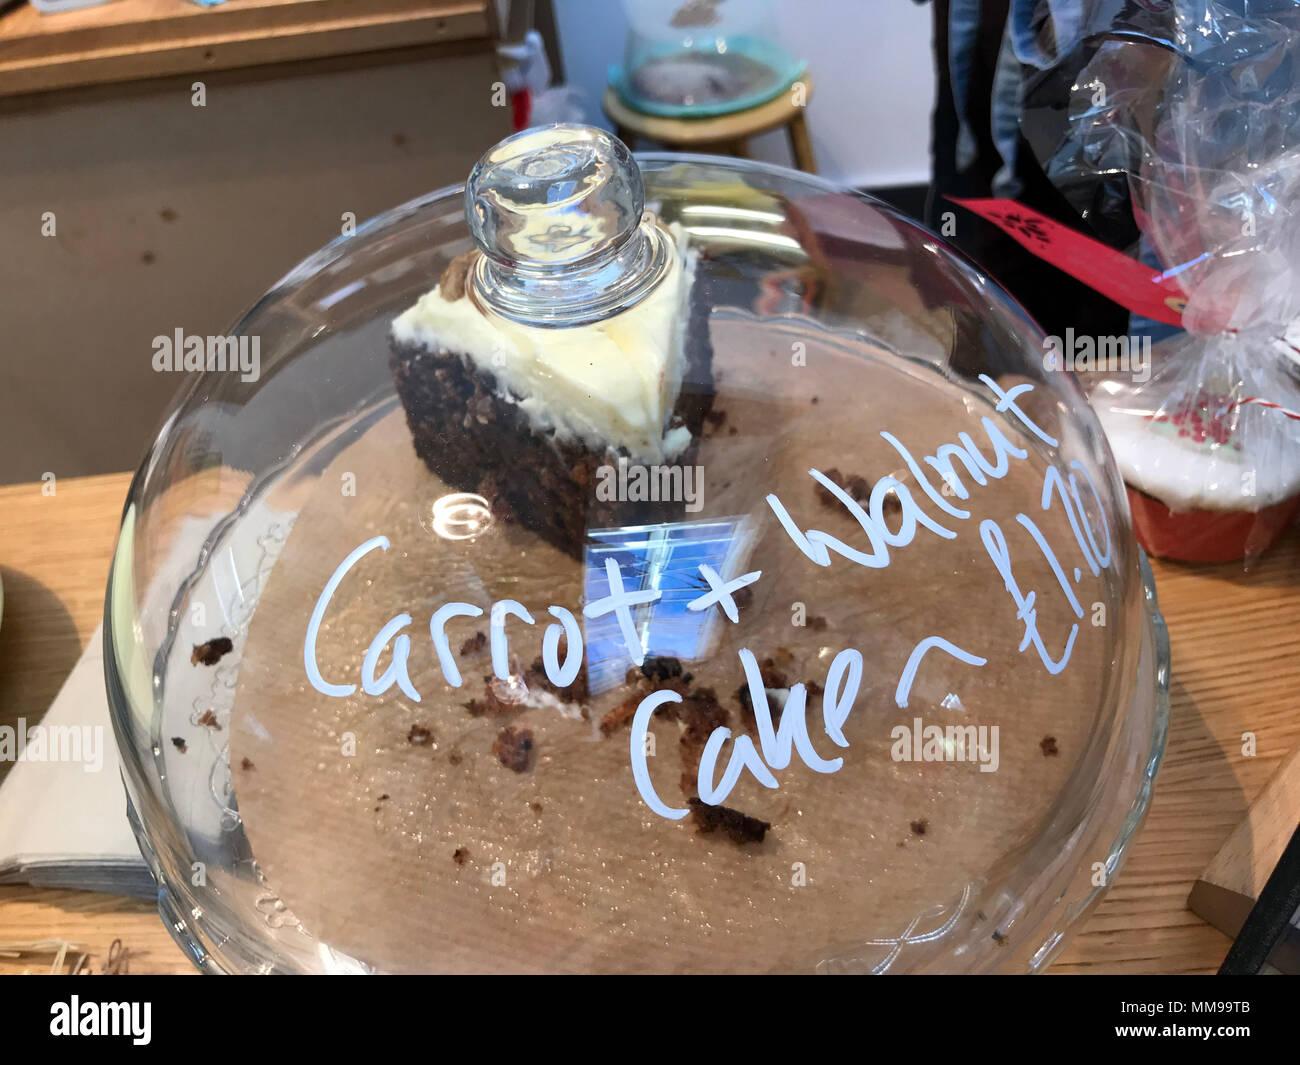 GoTonysmith,@HotpixUK,Carrot Walnut Cake,cake,counter,glass,cover,covered,for carrot + walnut cake,cake in a cafe,last slice,of cake,homemade,gluten-free,desert,sweet,treat,sin,sins,sweet sins,sugar,sugar rush,tempting cake,Sandford-on-Thames,Oxford,OX4,OX4 4YN,UK,Littlemore,Sandford Talking Shop,tasty cake,tasty,The village hall,village hall,07305307421,Henley Rd,Hemley Road